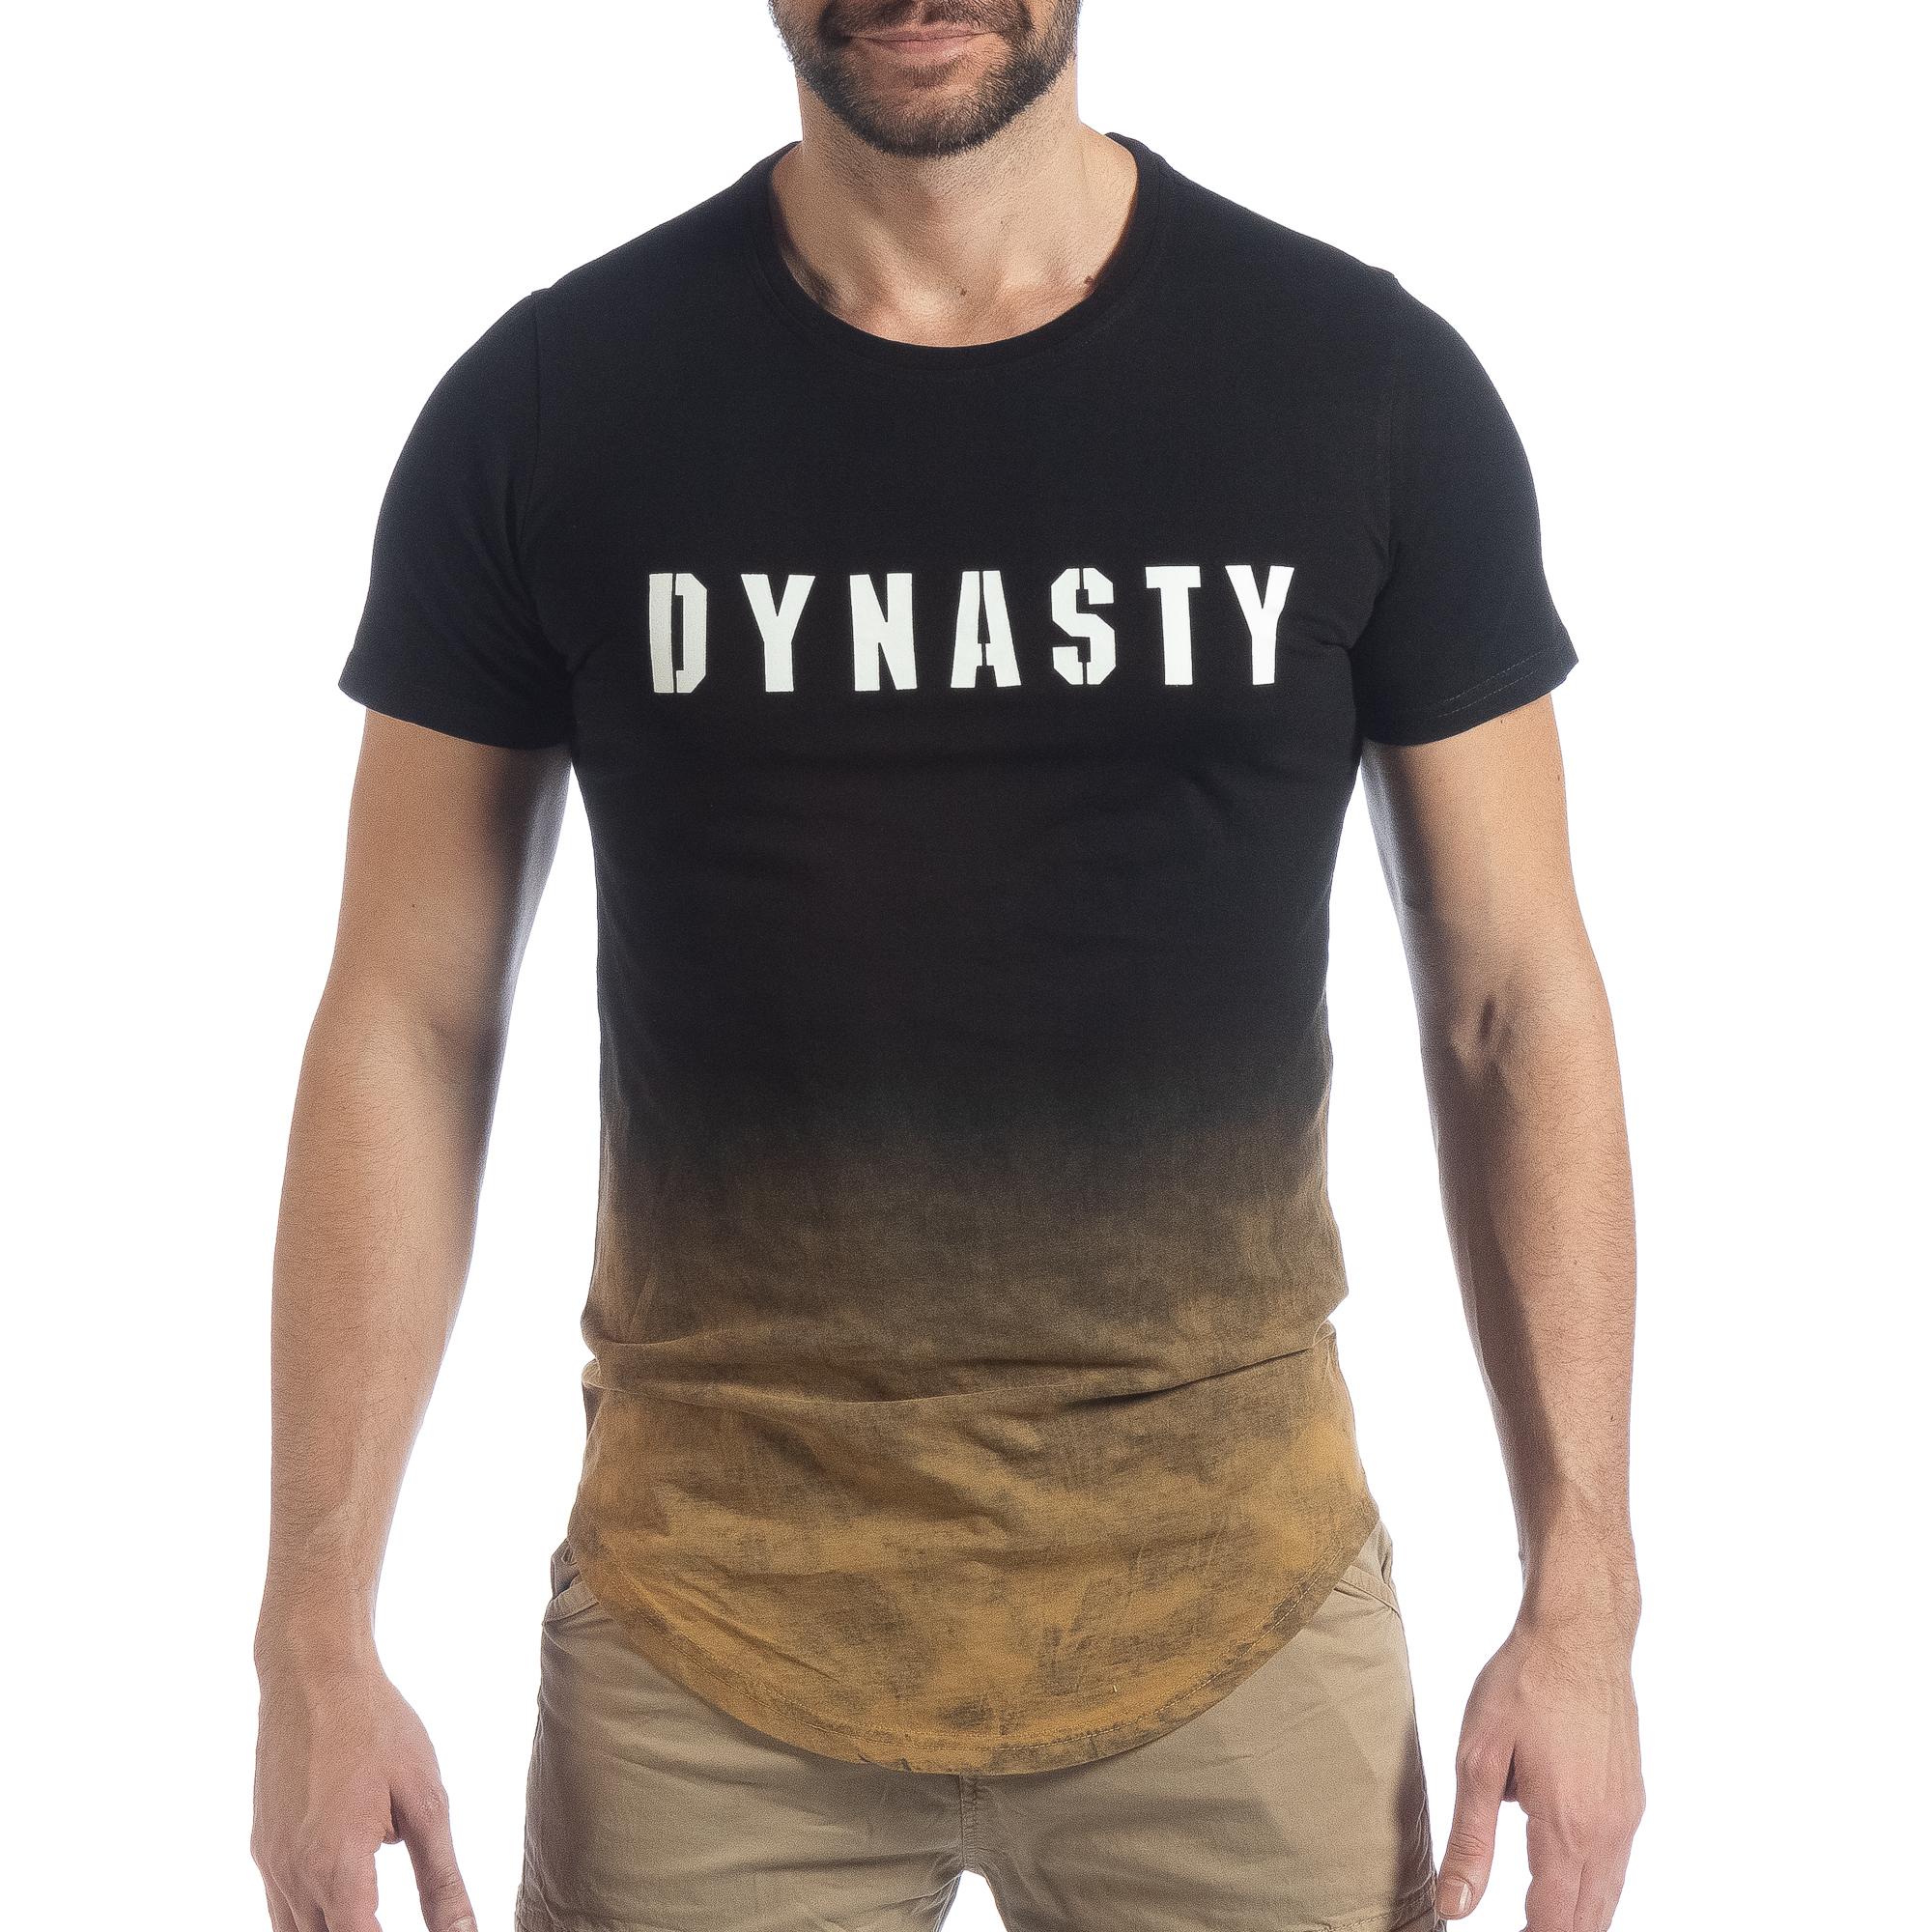 5b26dc36131c Ανδρική μαύρη κοντομάνικη μπλούζα Dynasty